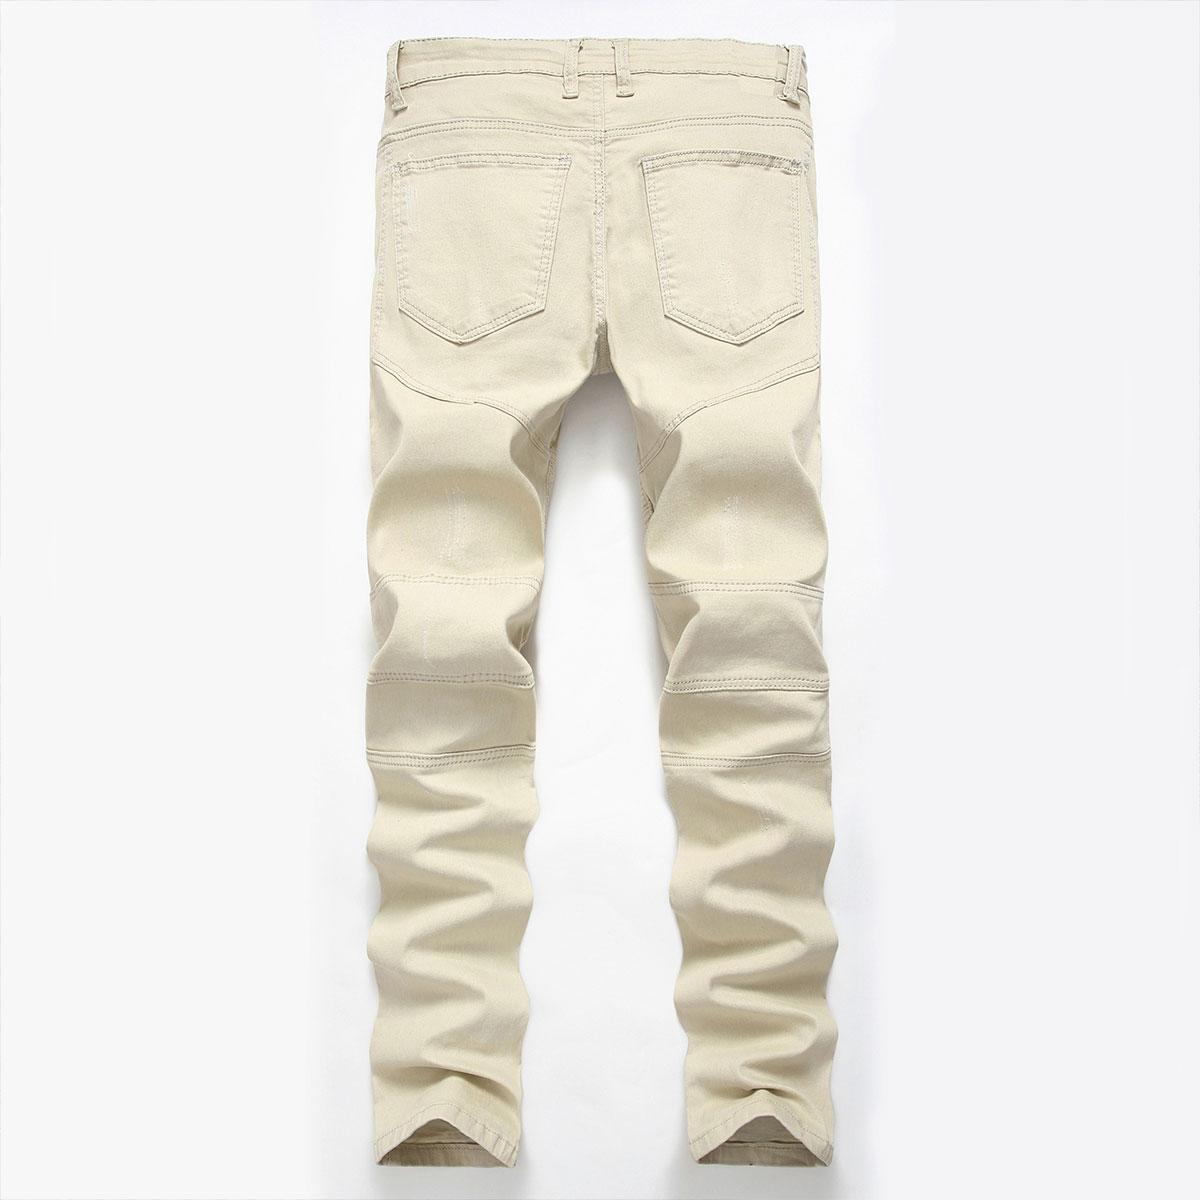 Men-039-s-Skinny-Biker-Jeans-Destroyed-Slim-Fit-Denim-Ripped-Pencil-Pants-Trousers thumbnail 37